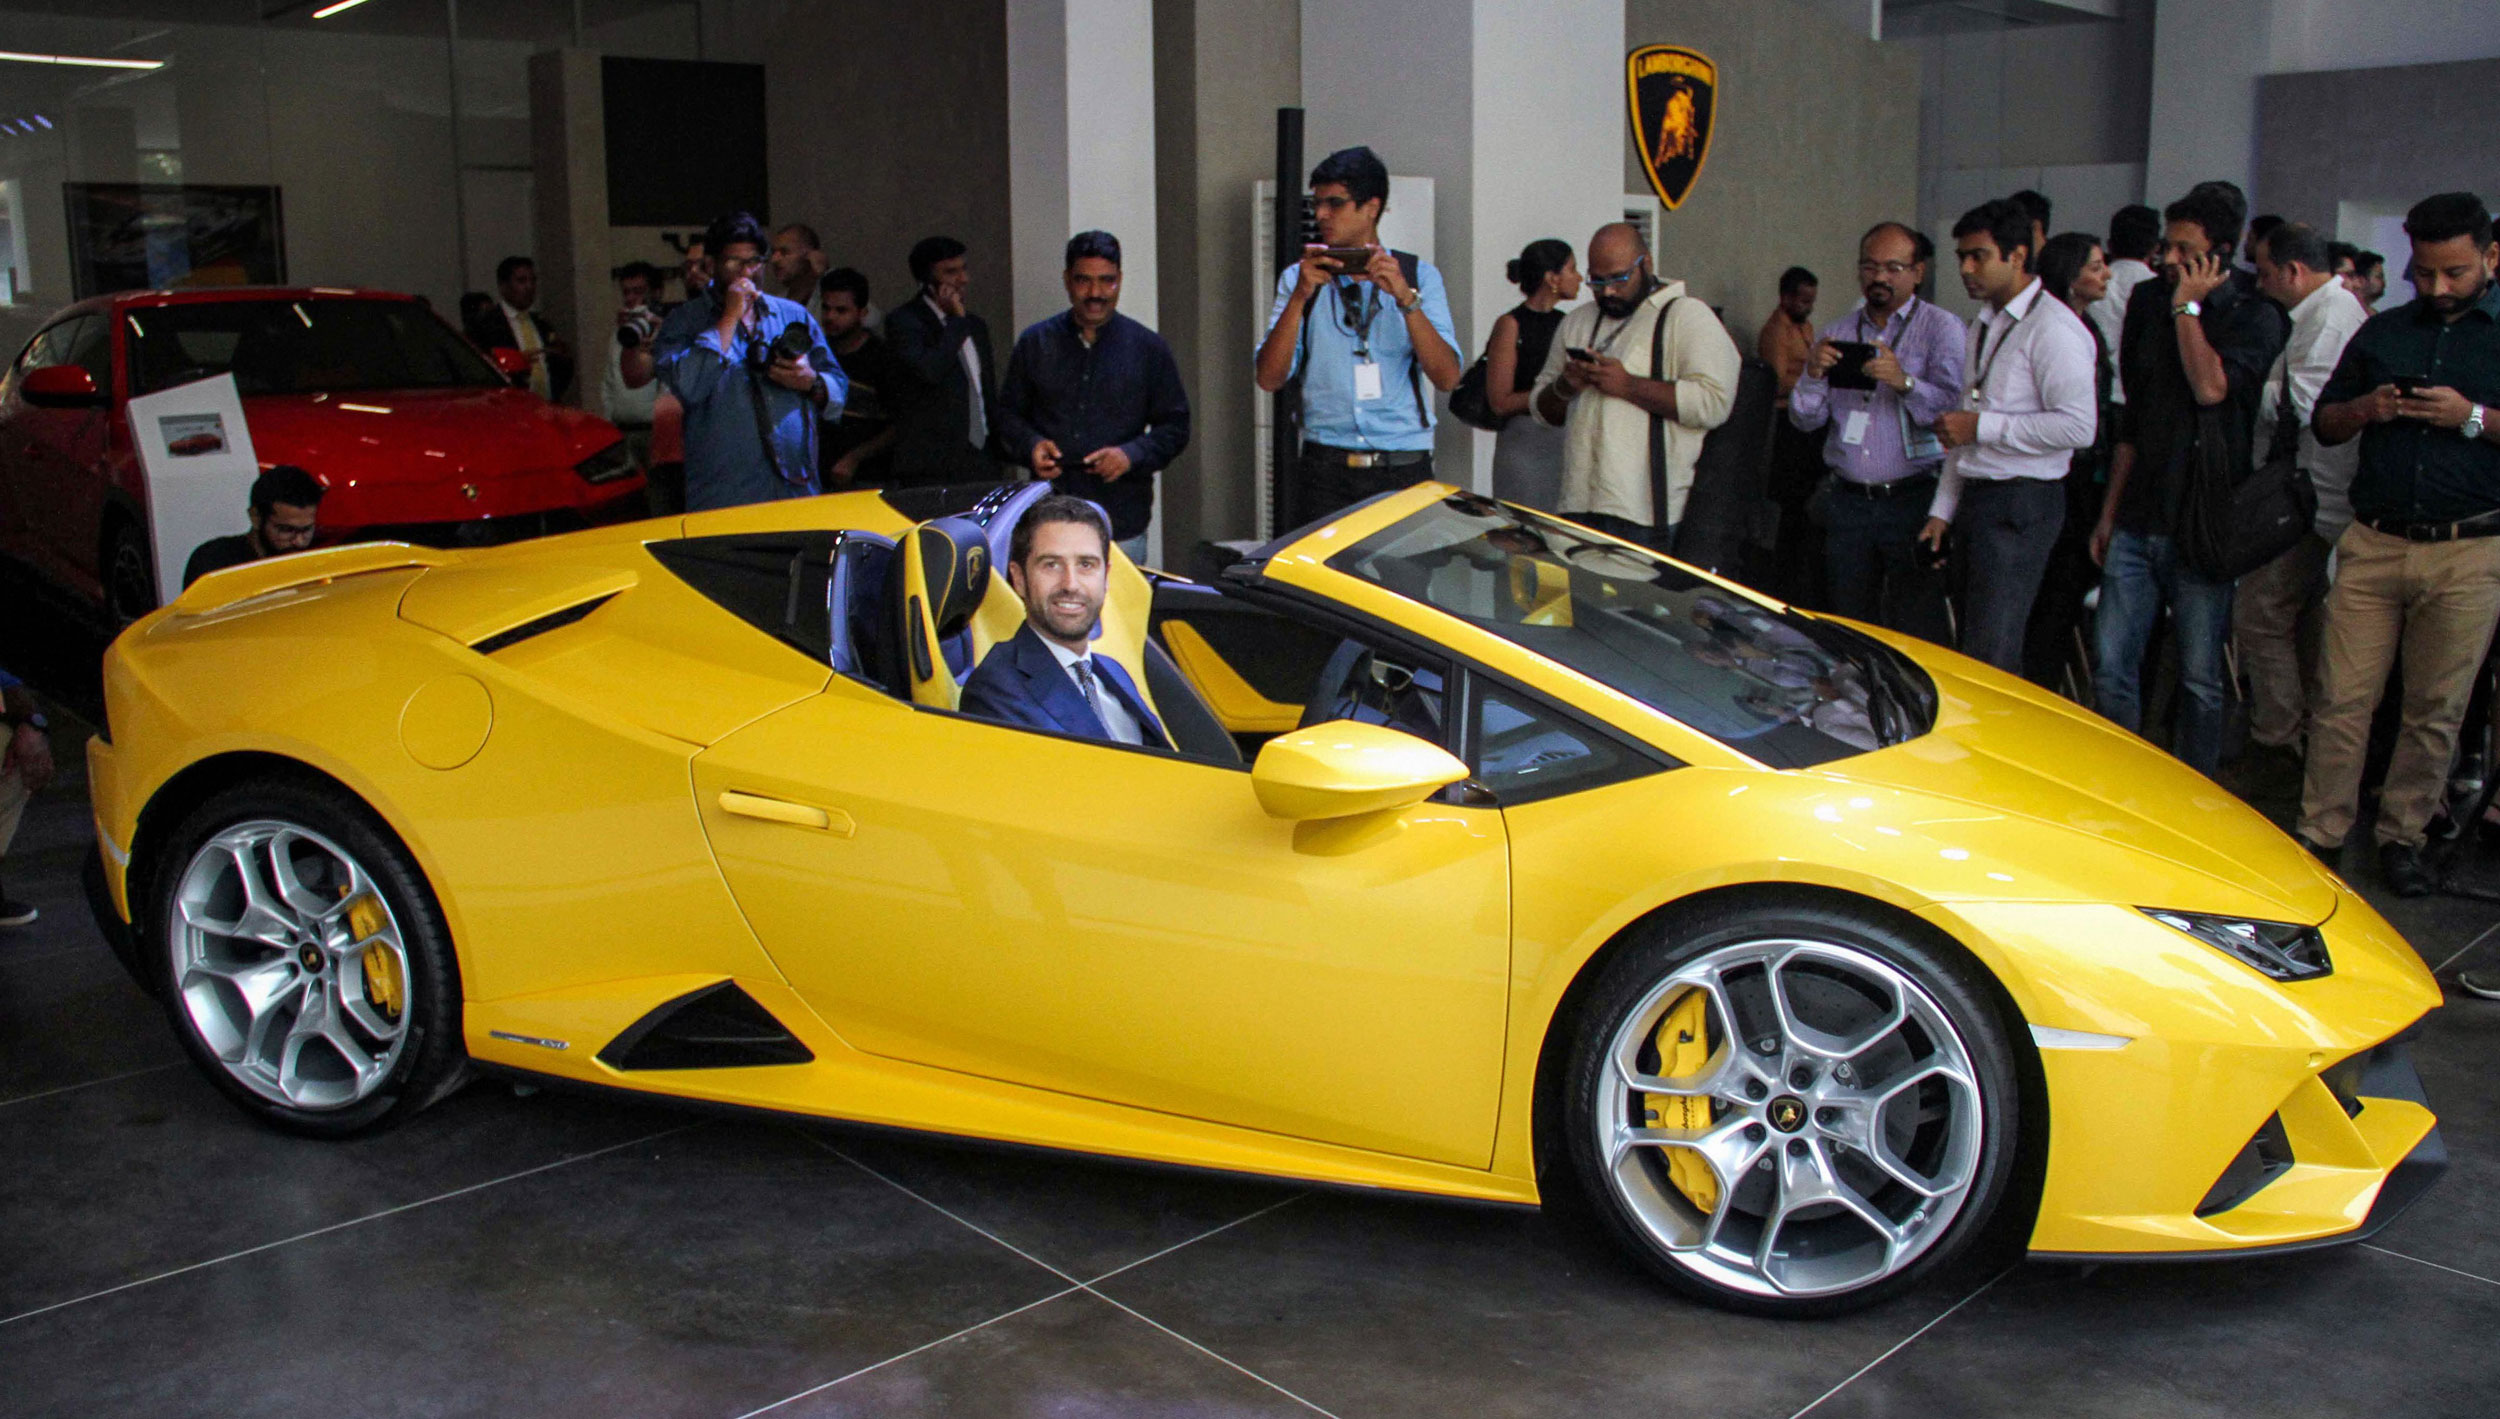 Matteo Ortenzi, CEO, Automobili Lamborghini Asia Pacific, with the Huracan EVO Spyder in Mumbai on Thursday.